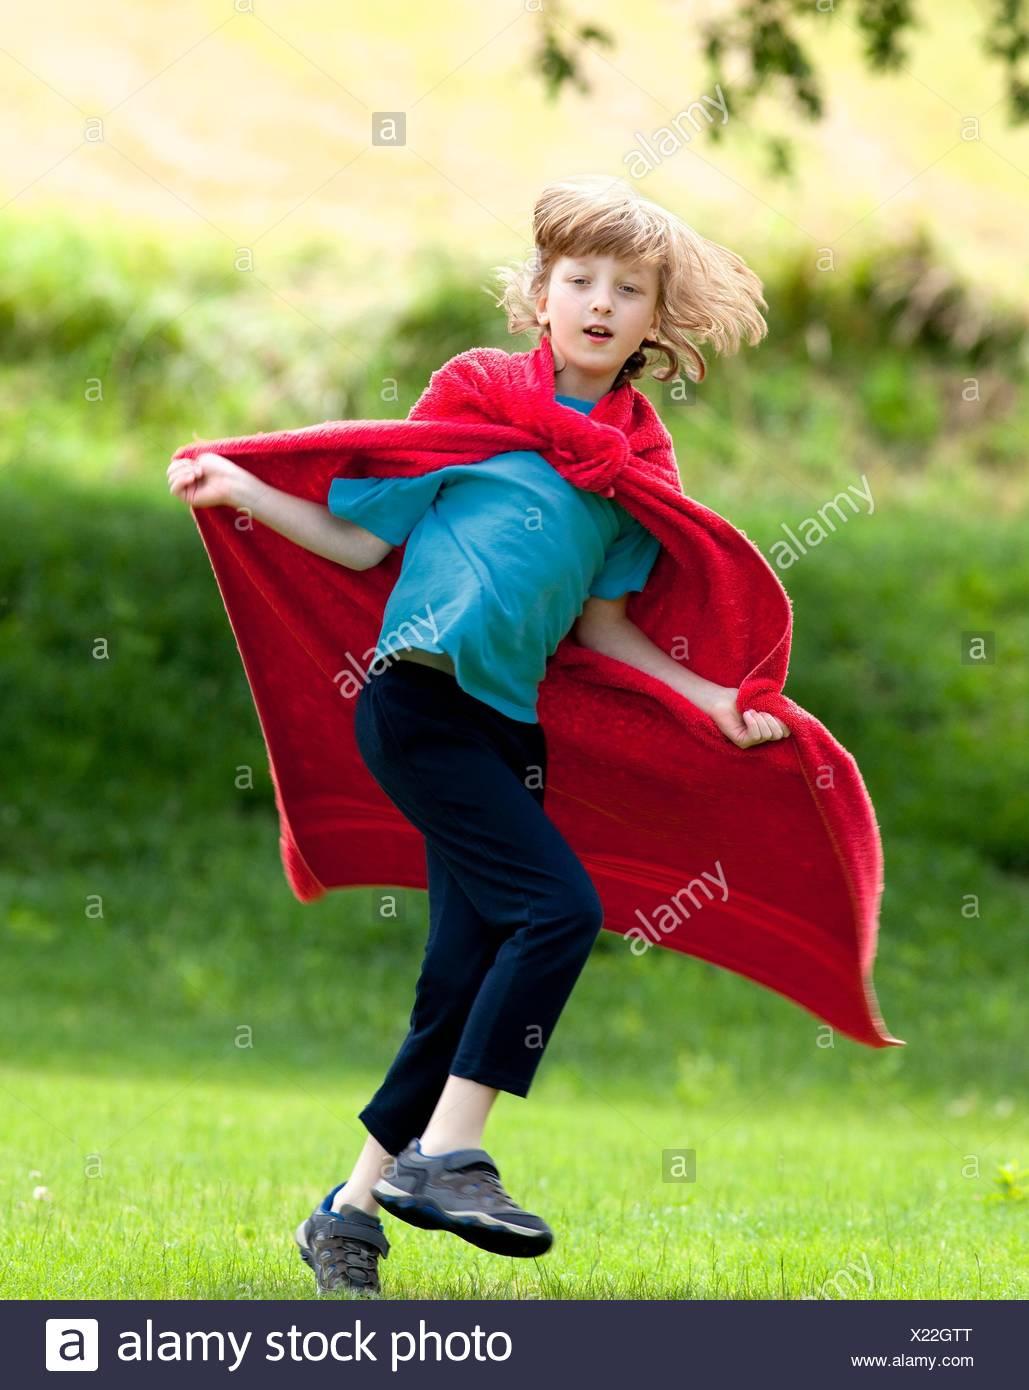 Junge Herum Laufen In Rot Handtuch Als Superhelden Umhang Stockfoto